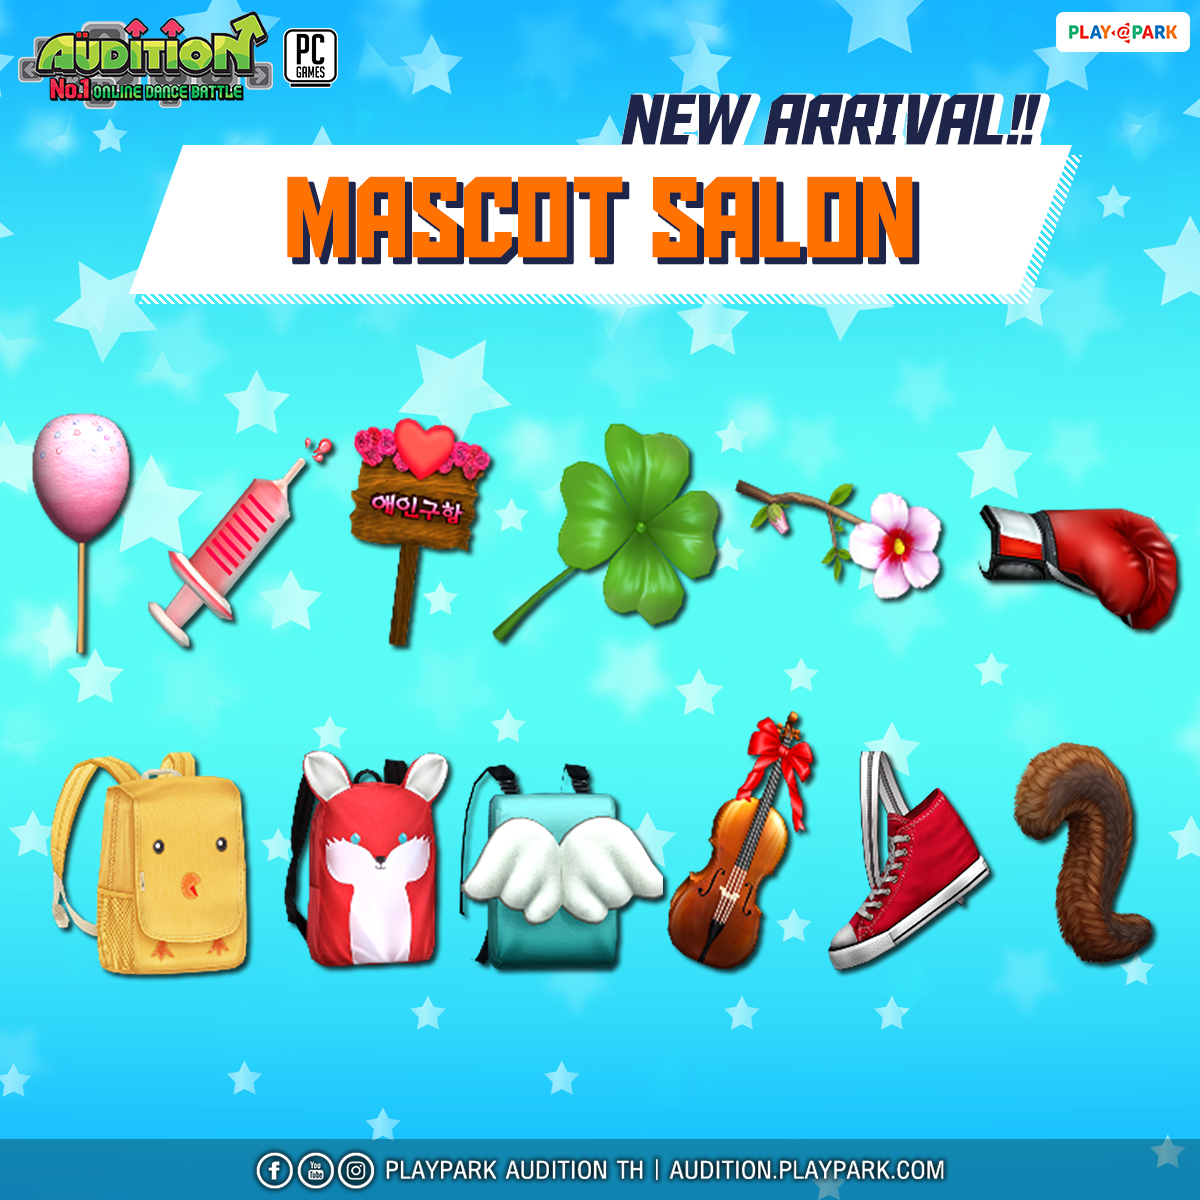 [AUDITION] 15 เมษายนนี้ อัปเดต Mascot อุปนิสัยใหม่, Mascot Accessory และเพลงใหม่ๆ อีกมากมาย